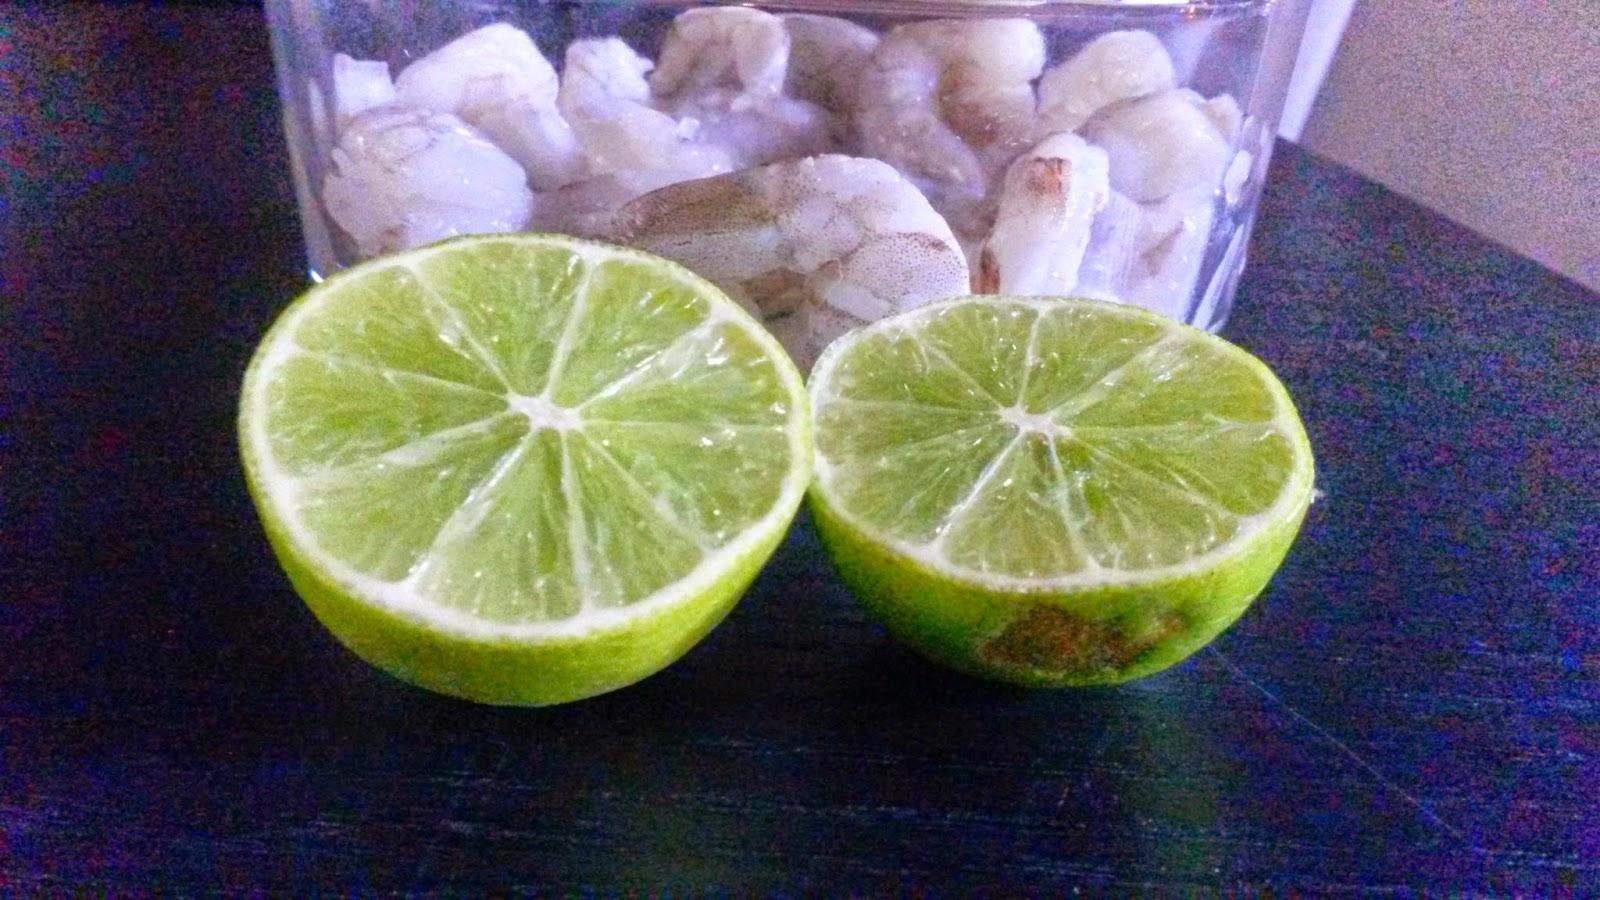 Delightful Shrimp and Limes for Prep